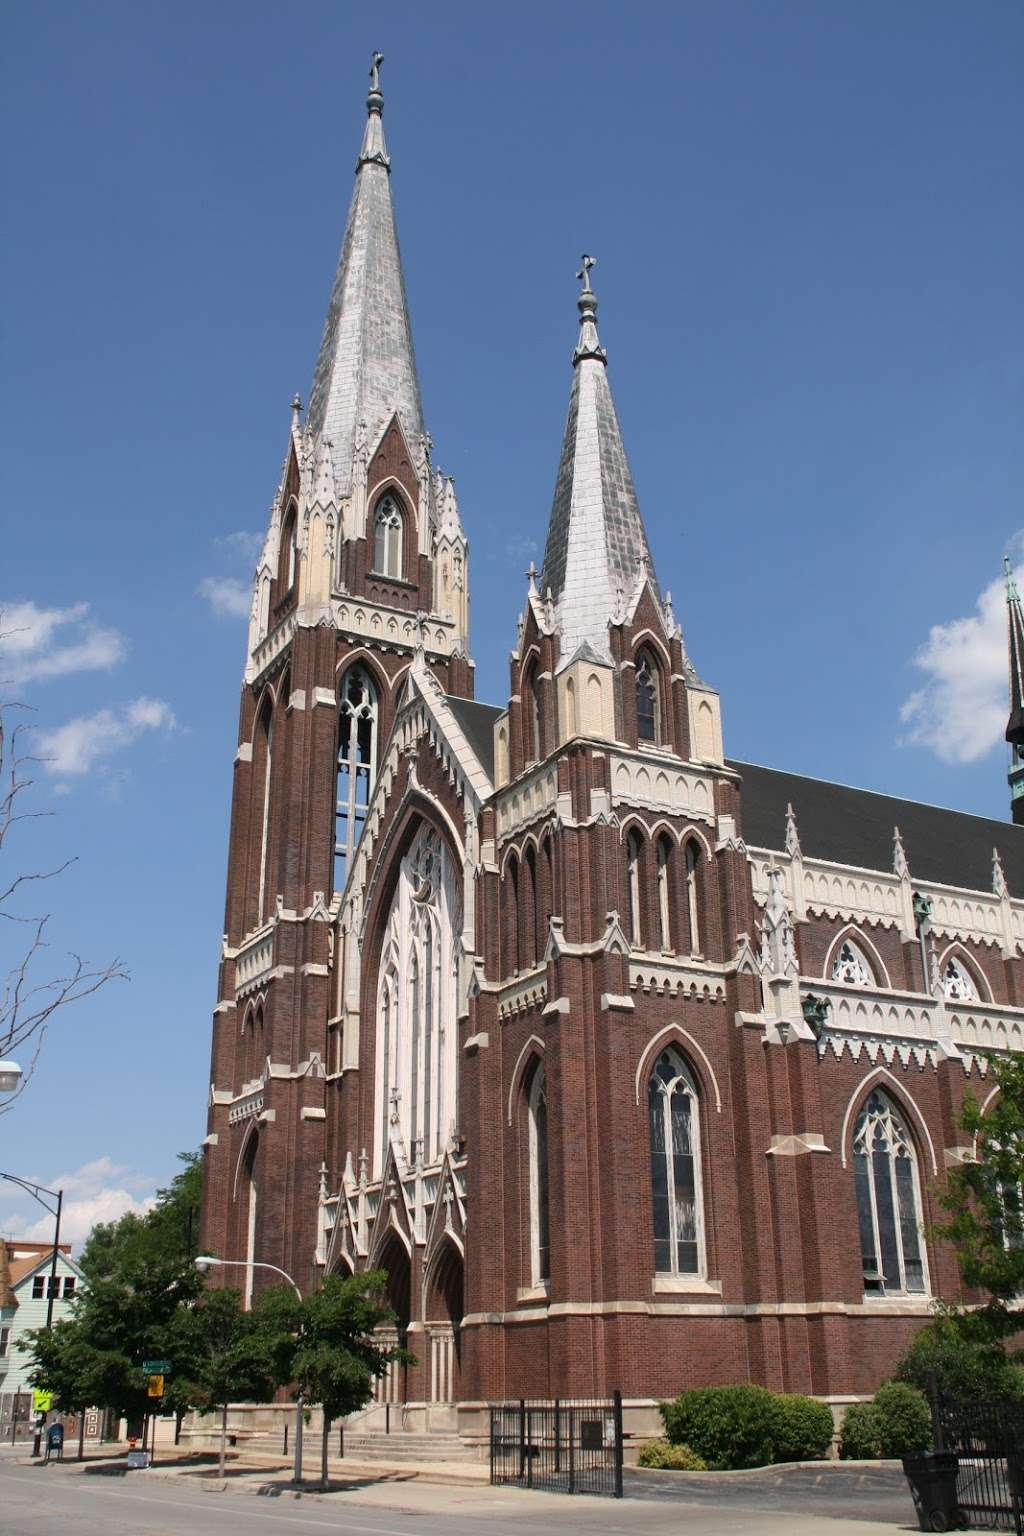 St. Michael the Archangel Roman Catholic Church - church  | Photo 2 of 10 | Address: 8237 S South Shore Dr, Chicago, IL 60617, USA | Phone: (773) 734-4921